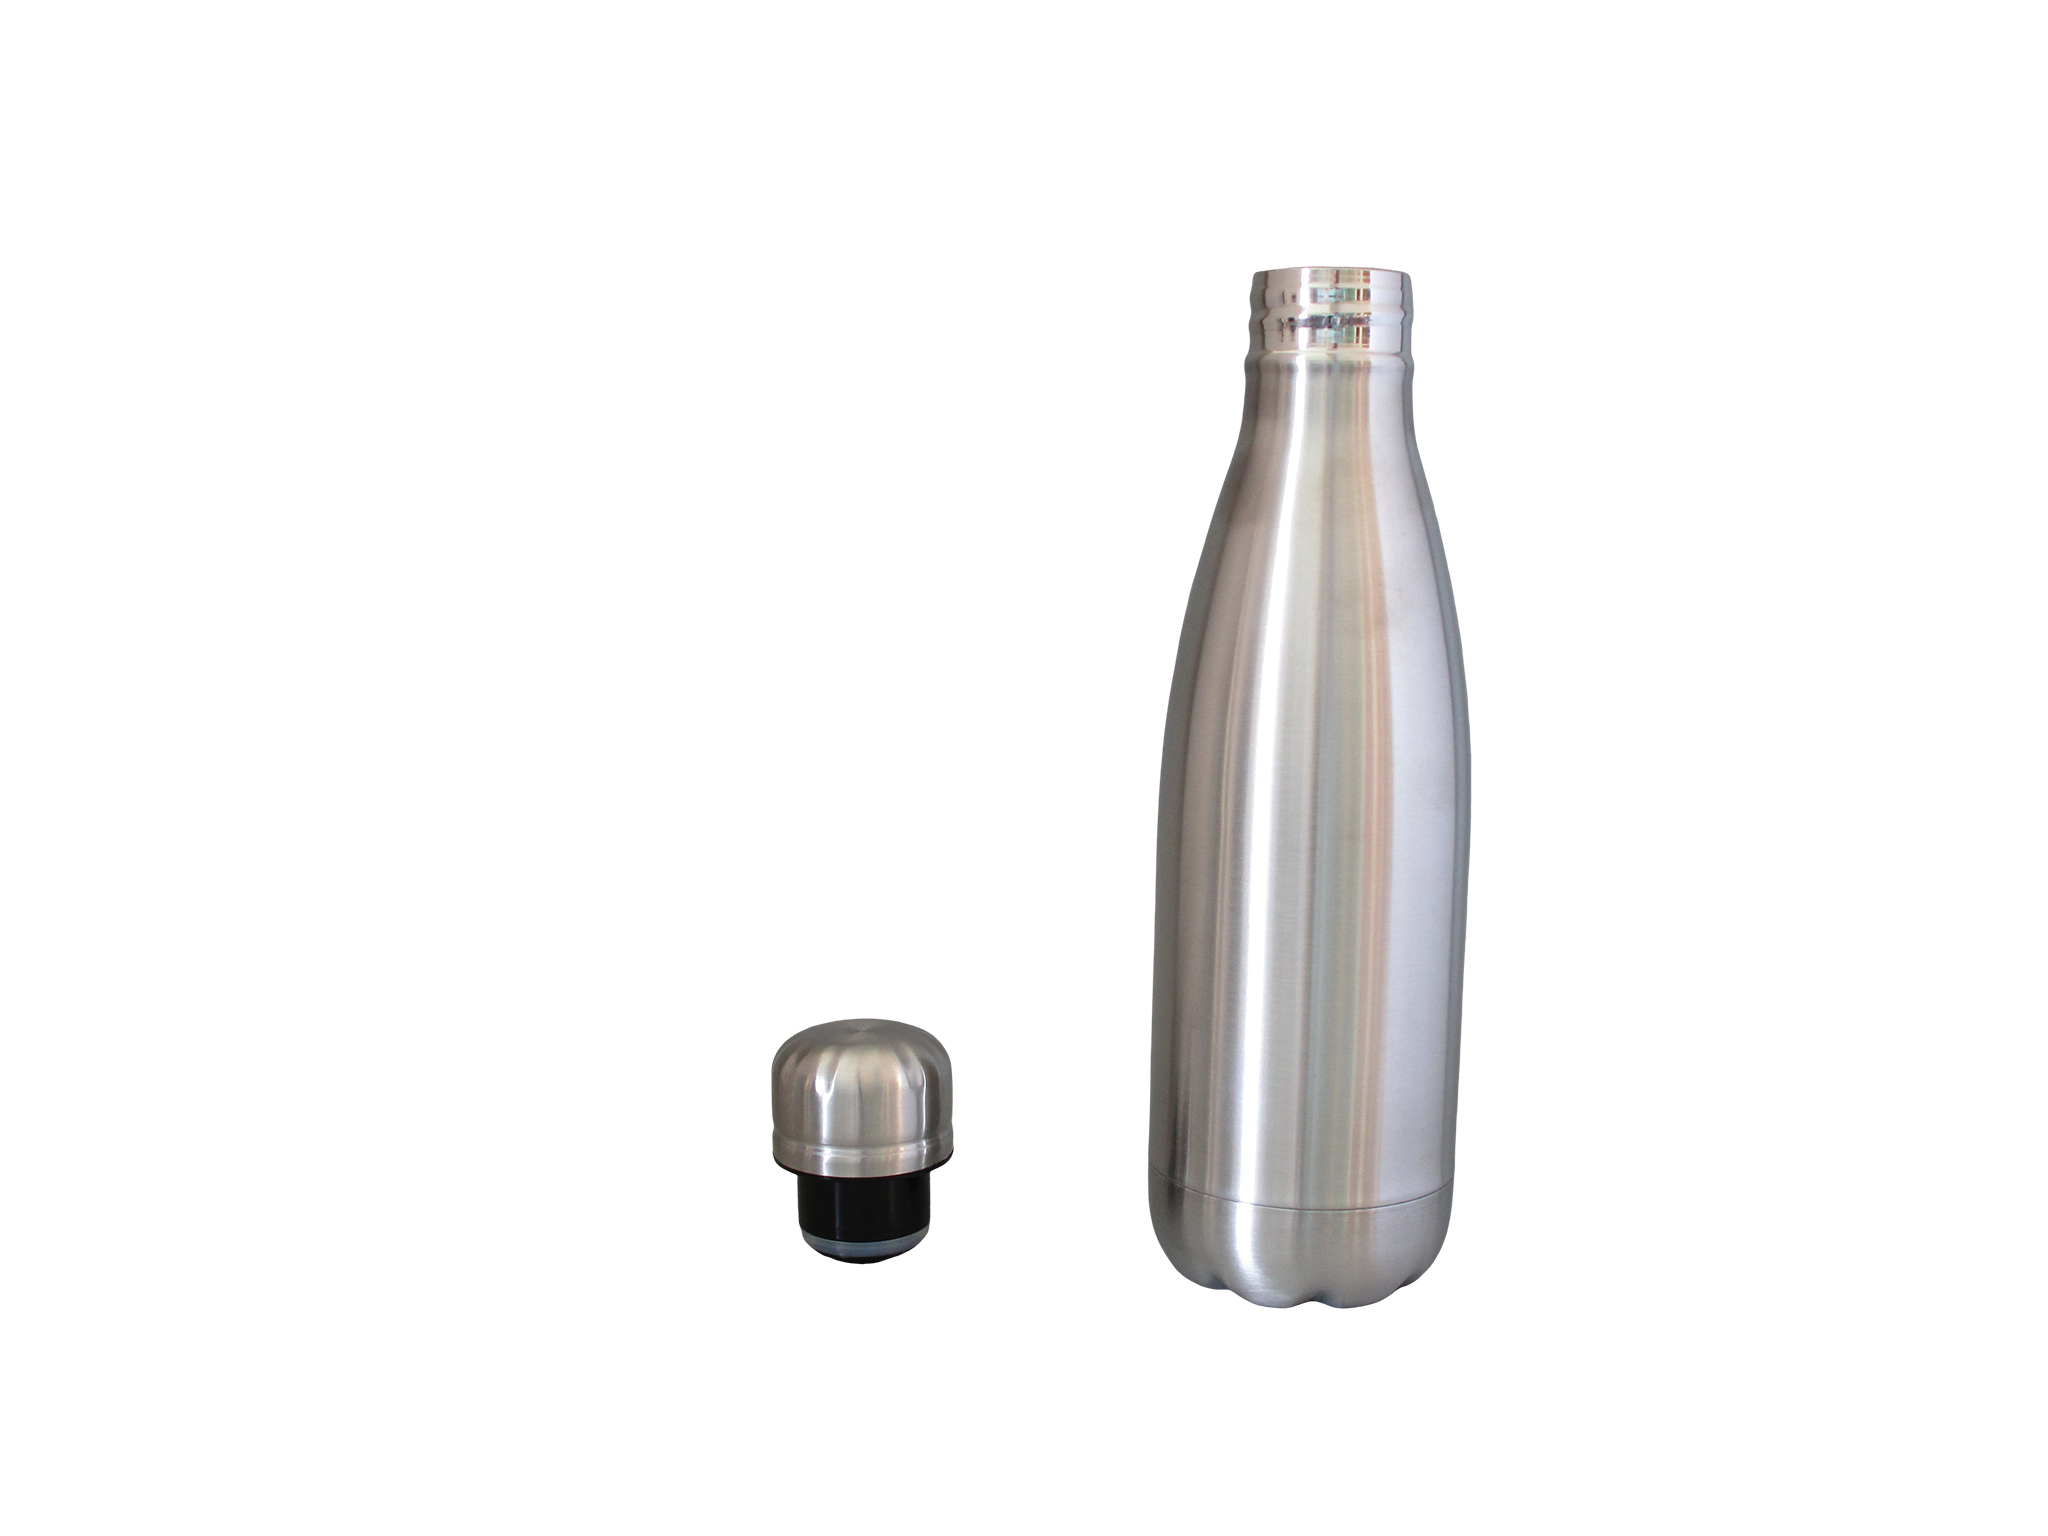 TANGO050-900 - Isoleerfles RVS onbreekbaar mat 0.50 L - Isobel